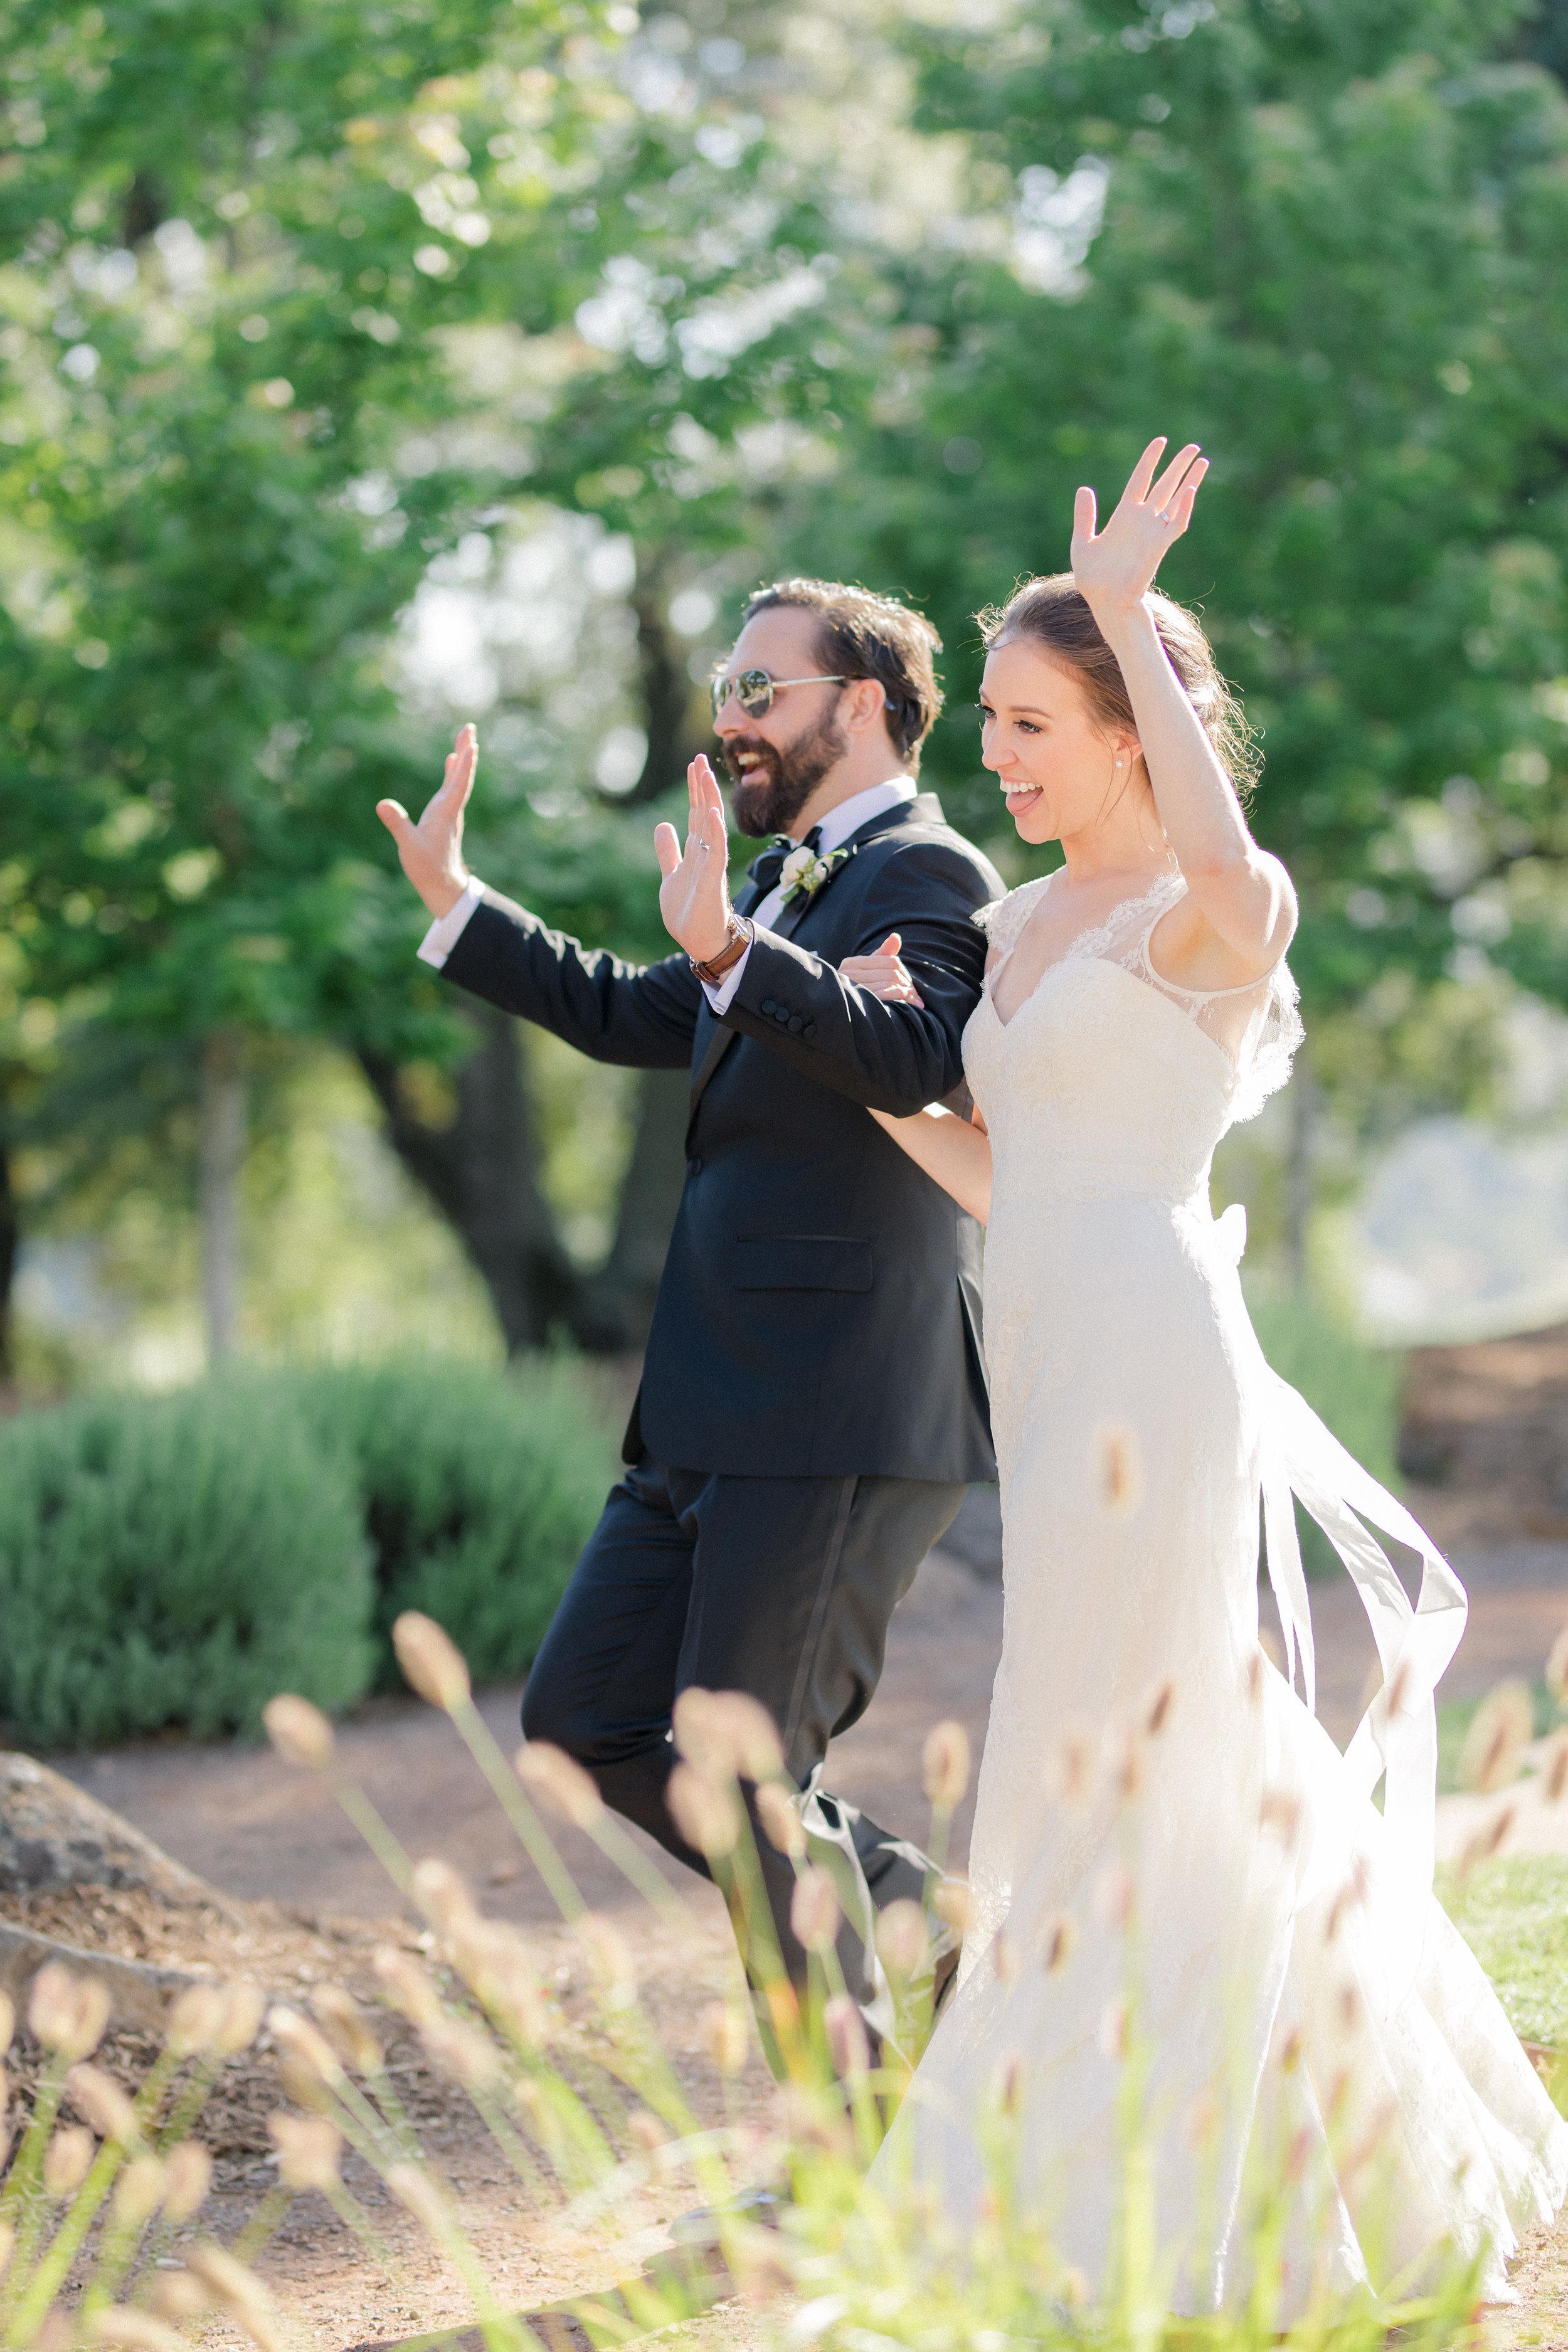 california-wedding-day-lrelyea-events-lori-paladino-photography16.jpg